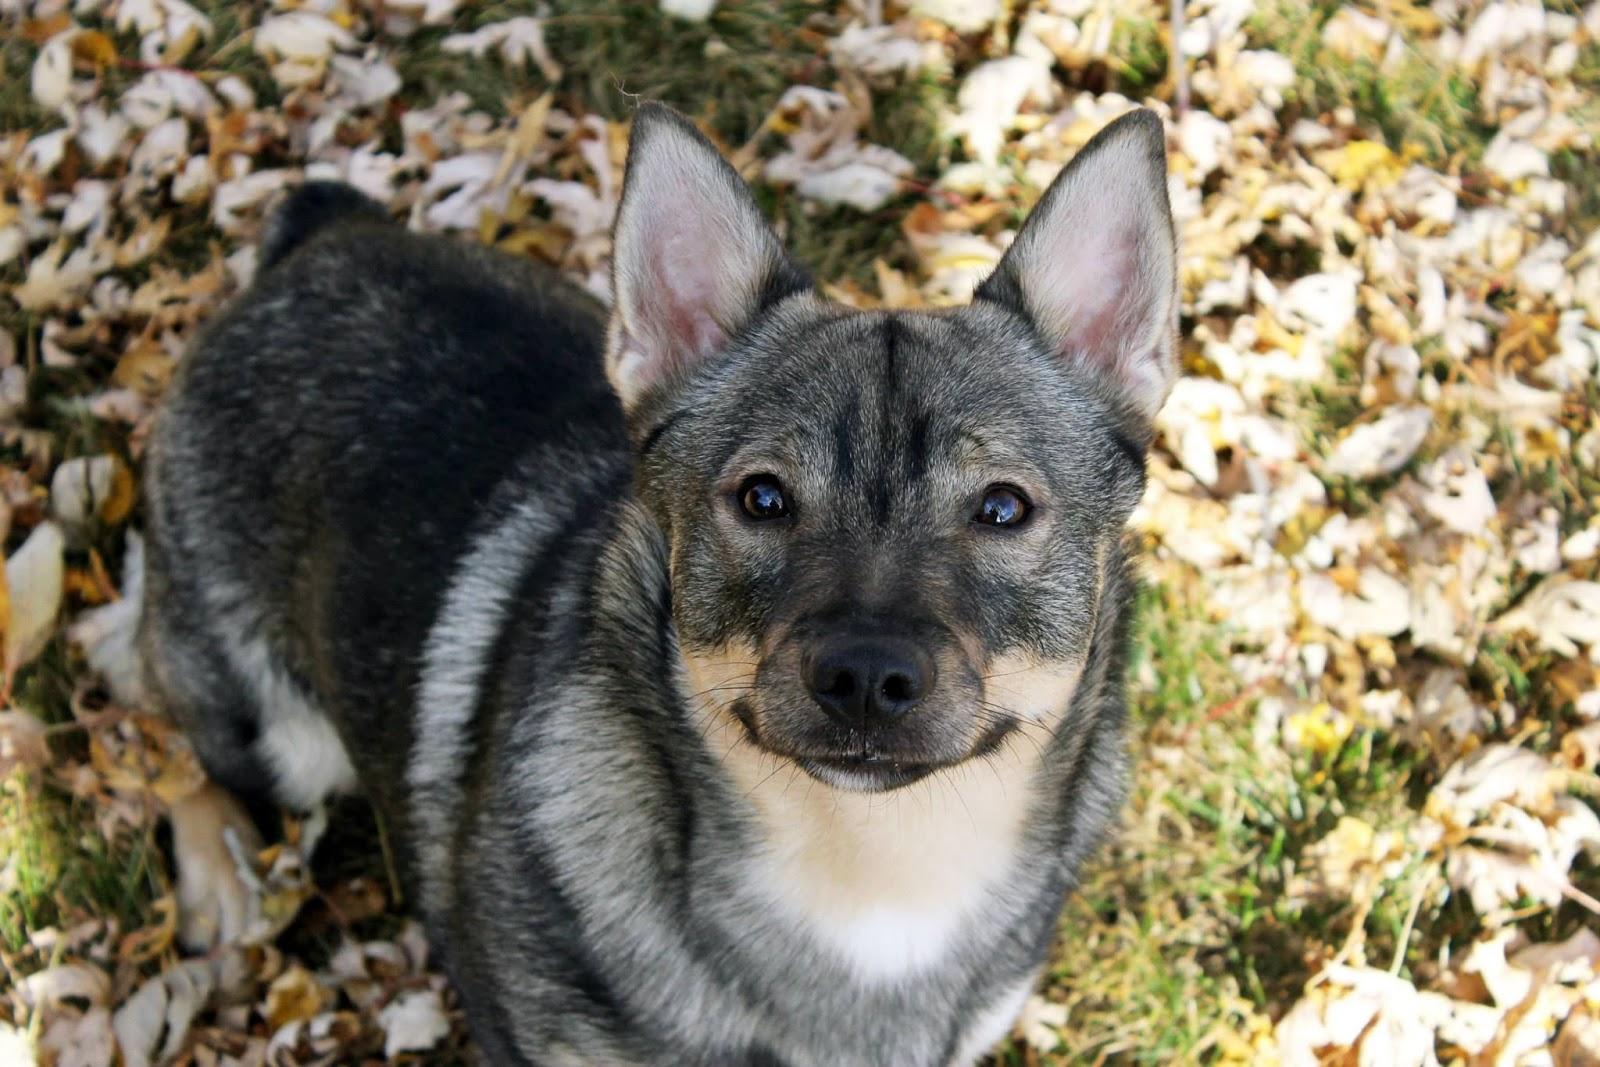 White Wolf : Meet the Swedish Vallhund, an amazing looking ...